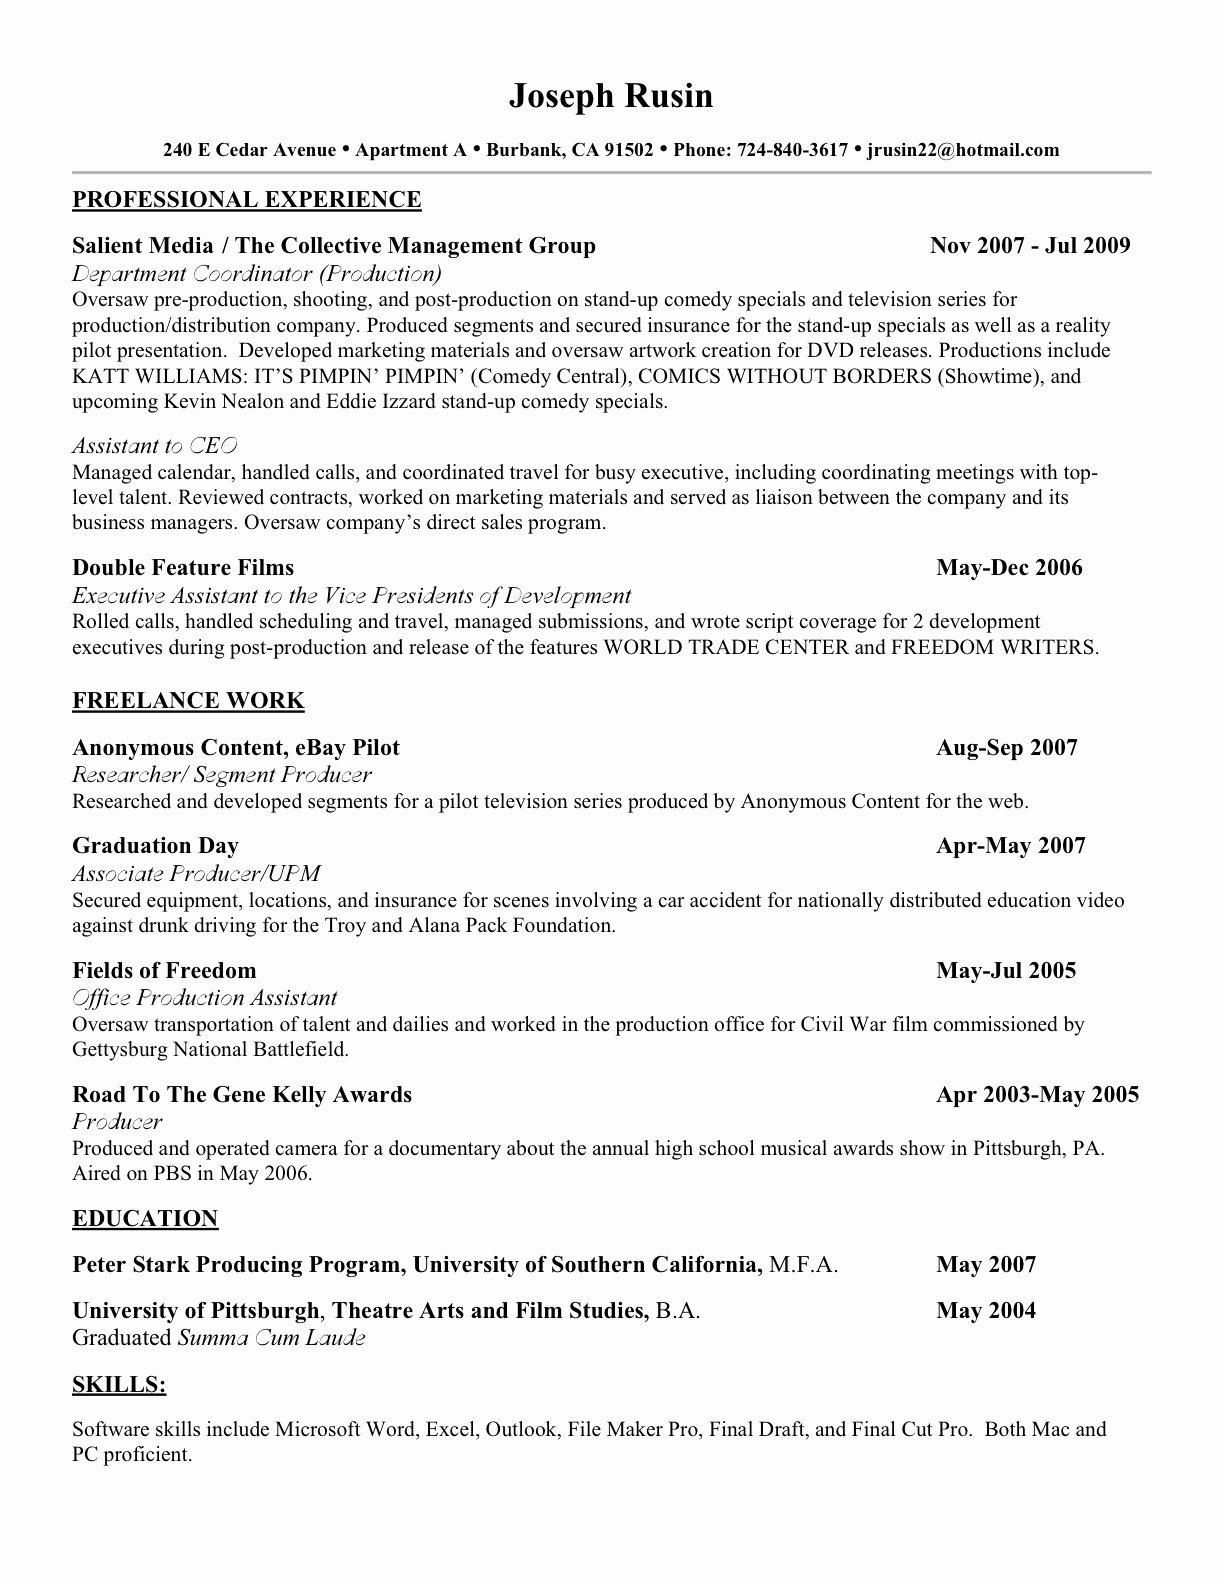 Make A Resume for Free Line